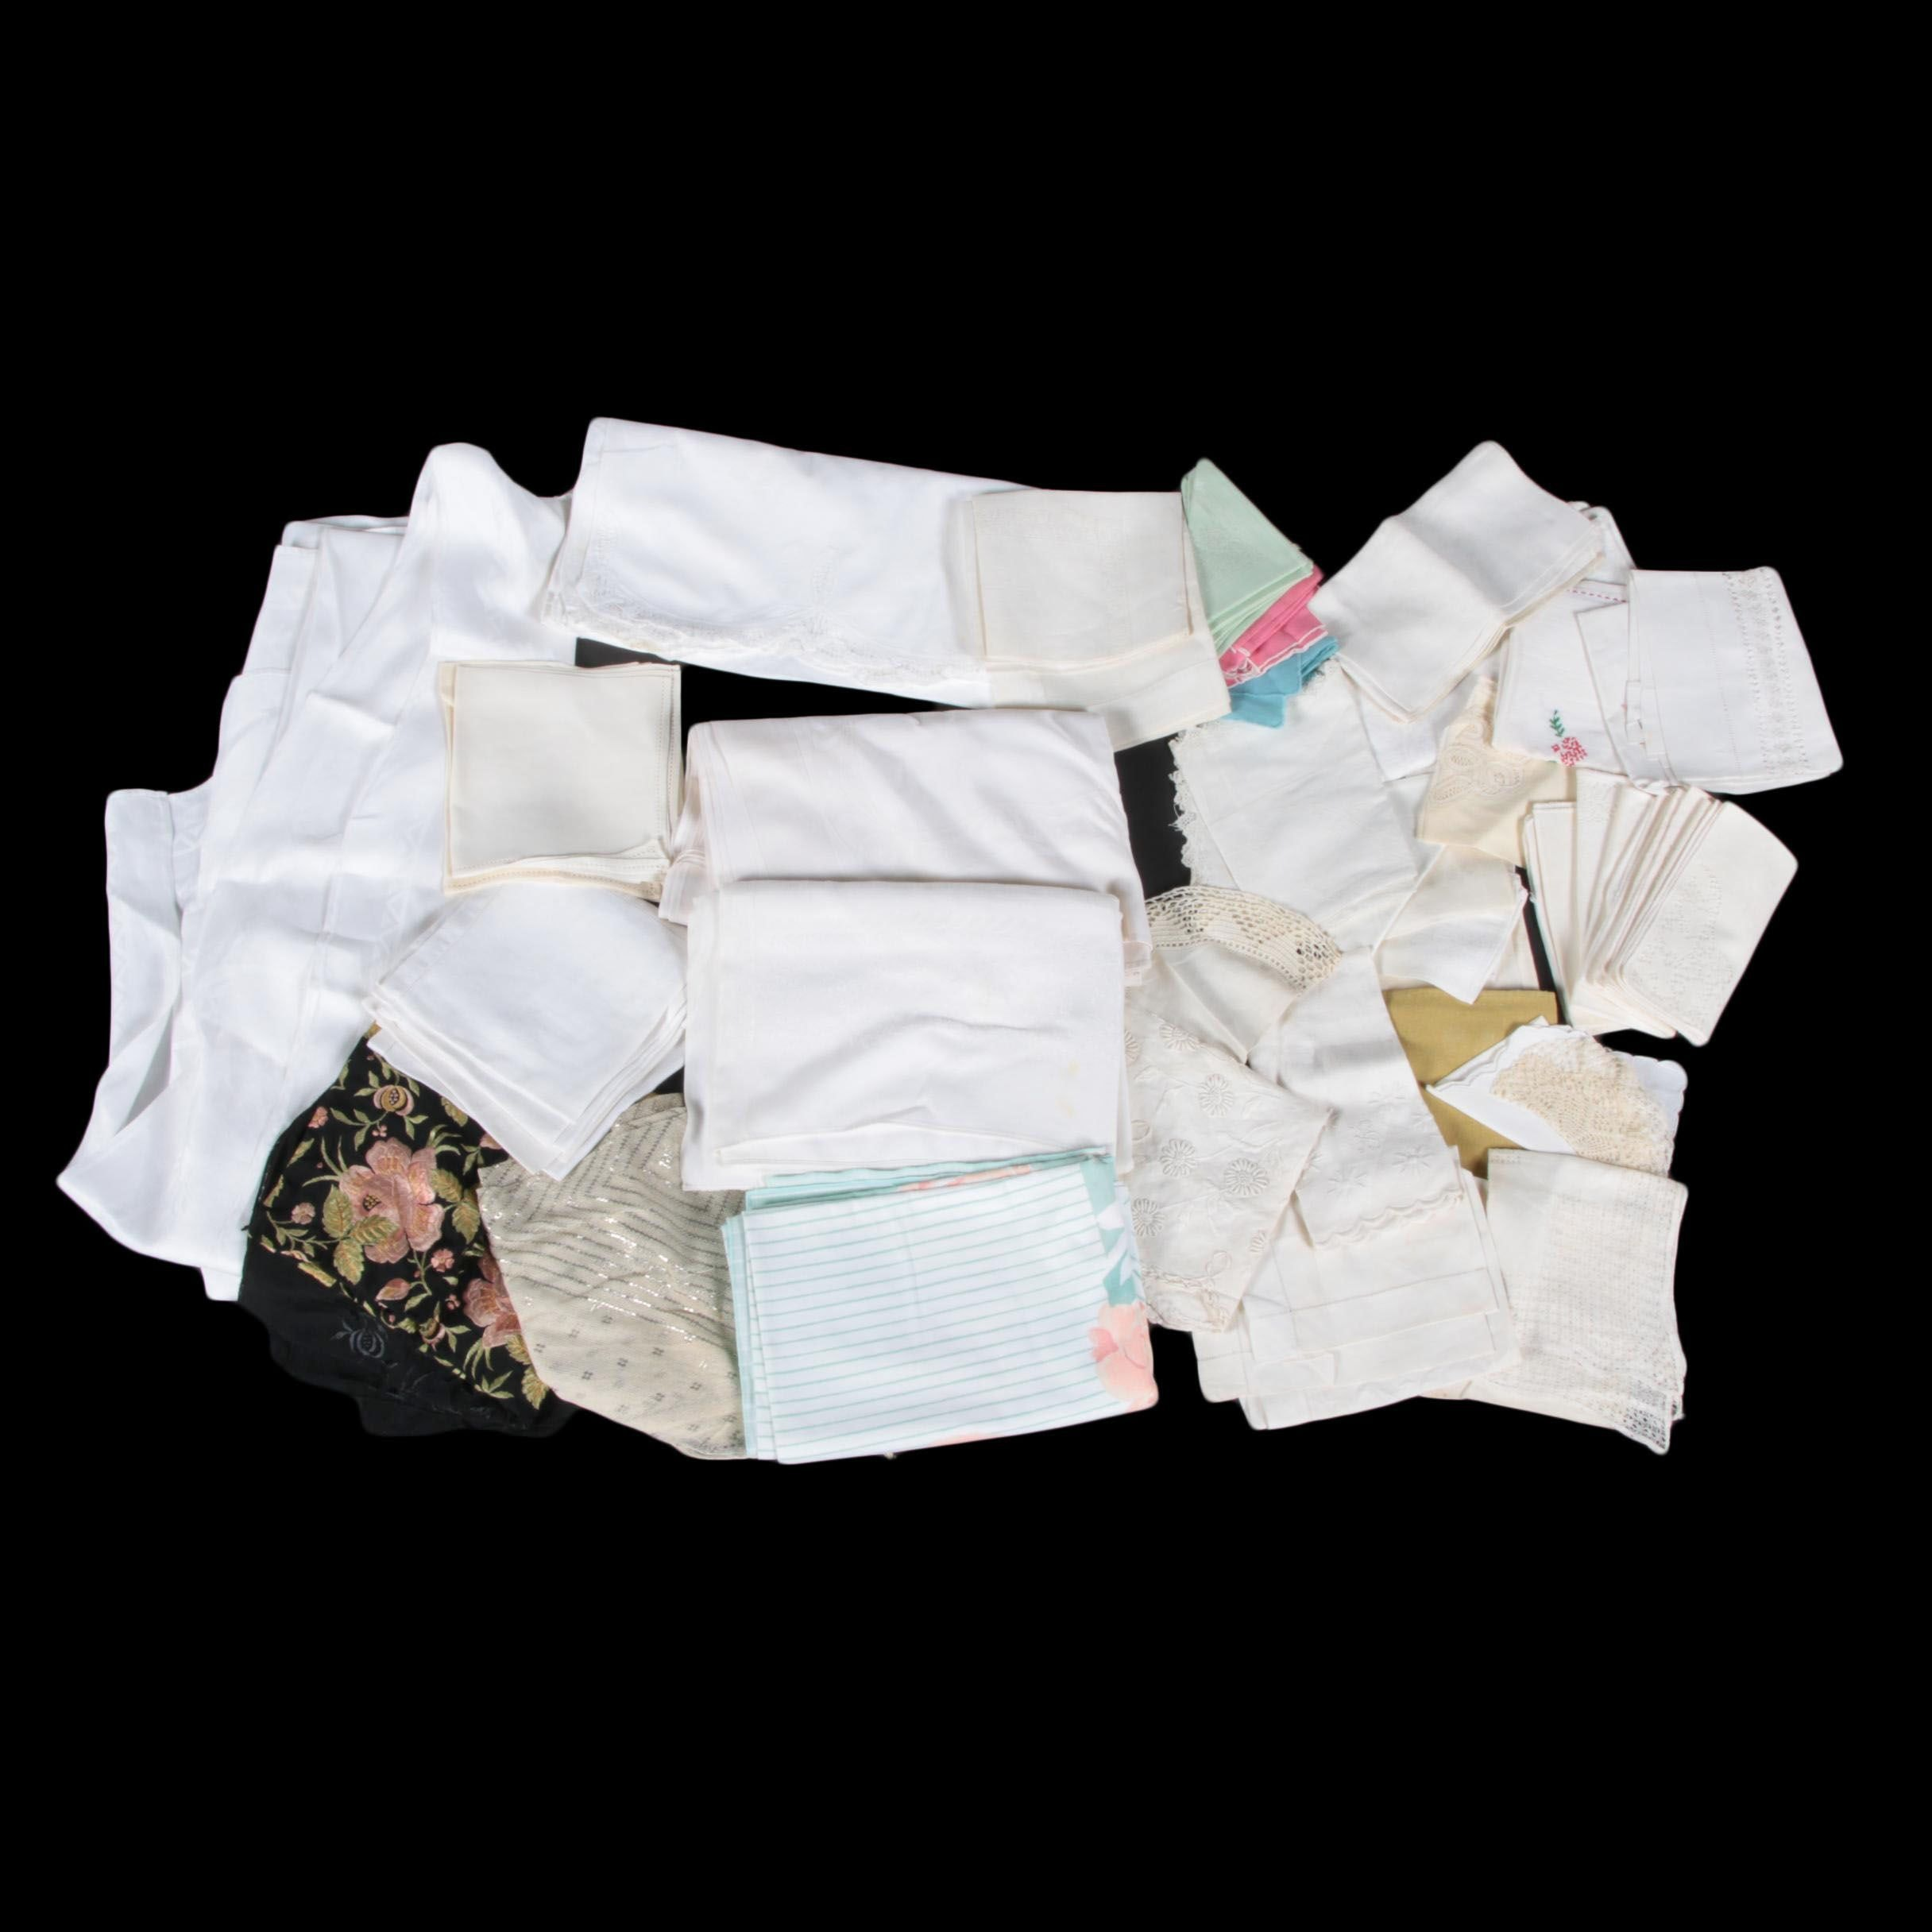 Assortment of Vintage Linens